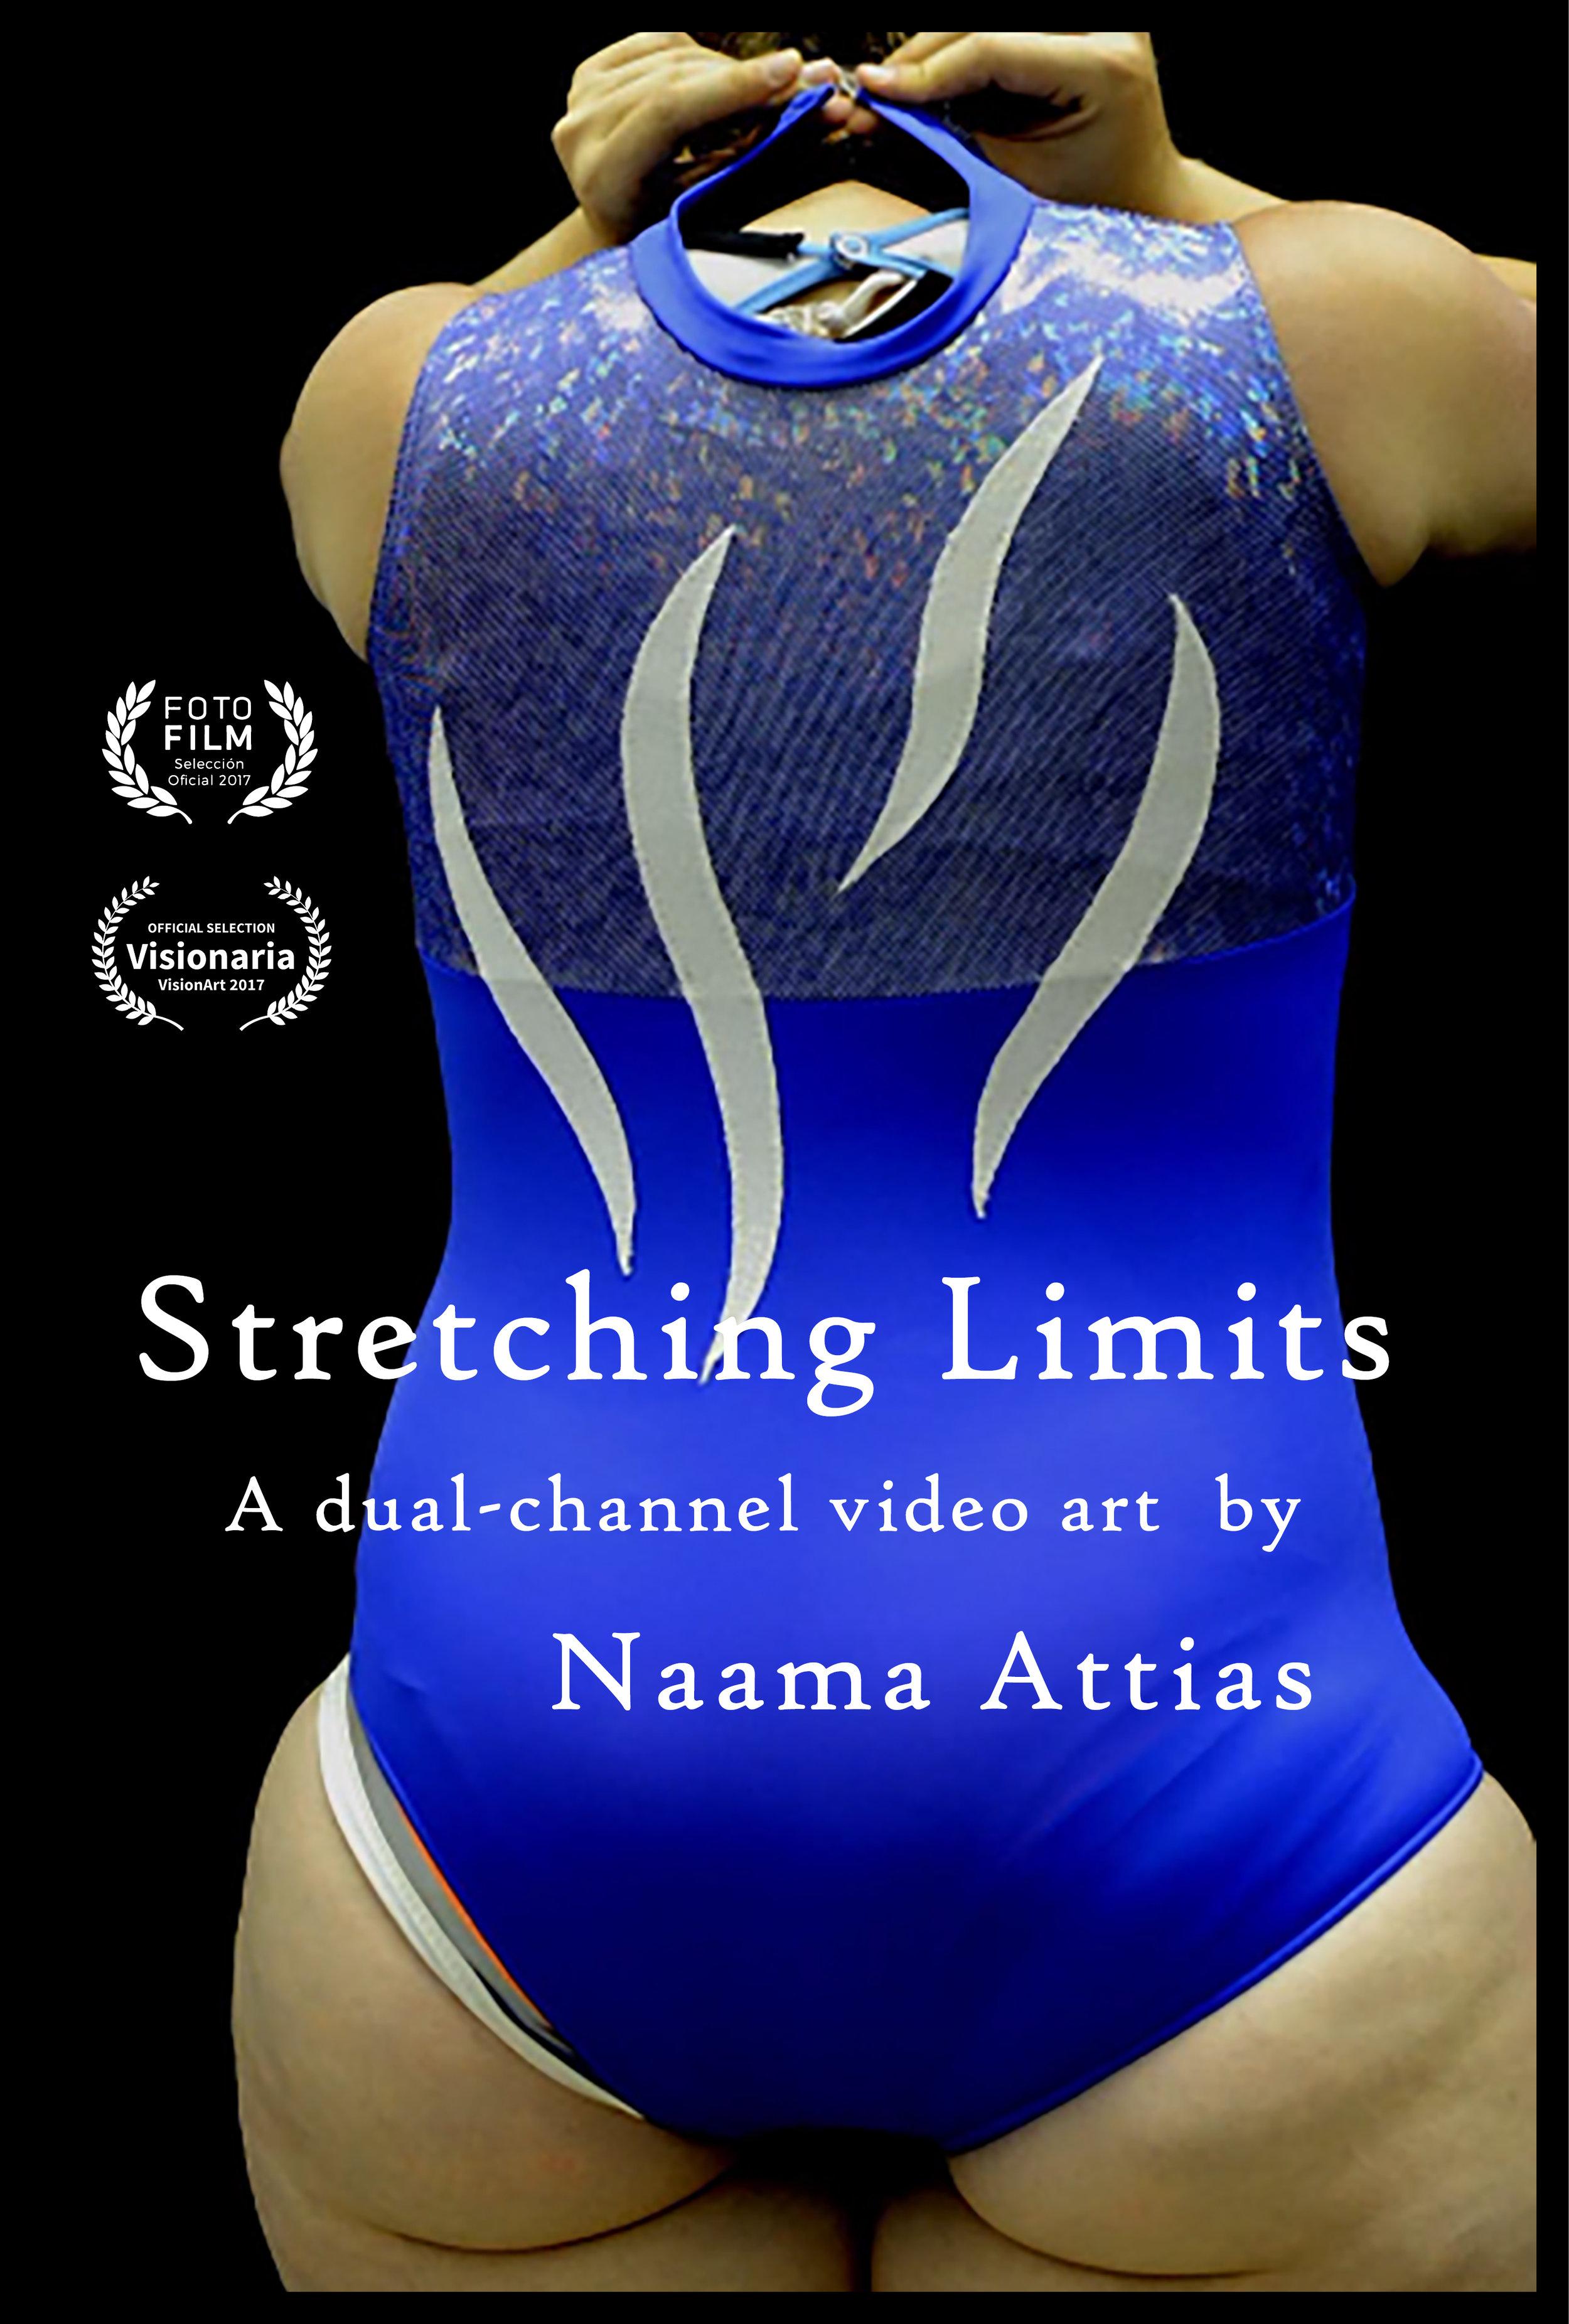 Stretching poster - 30.3.2018.jpg